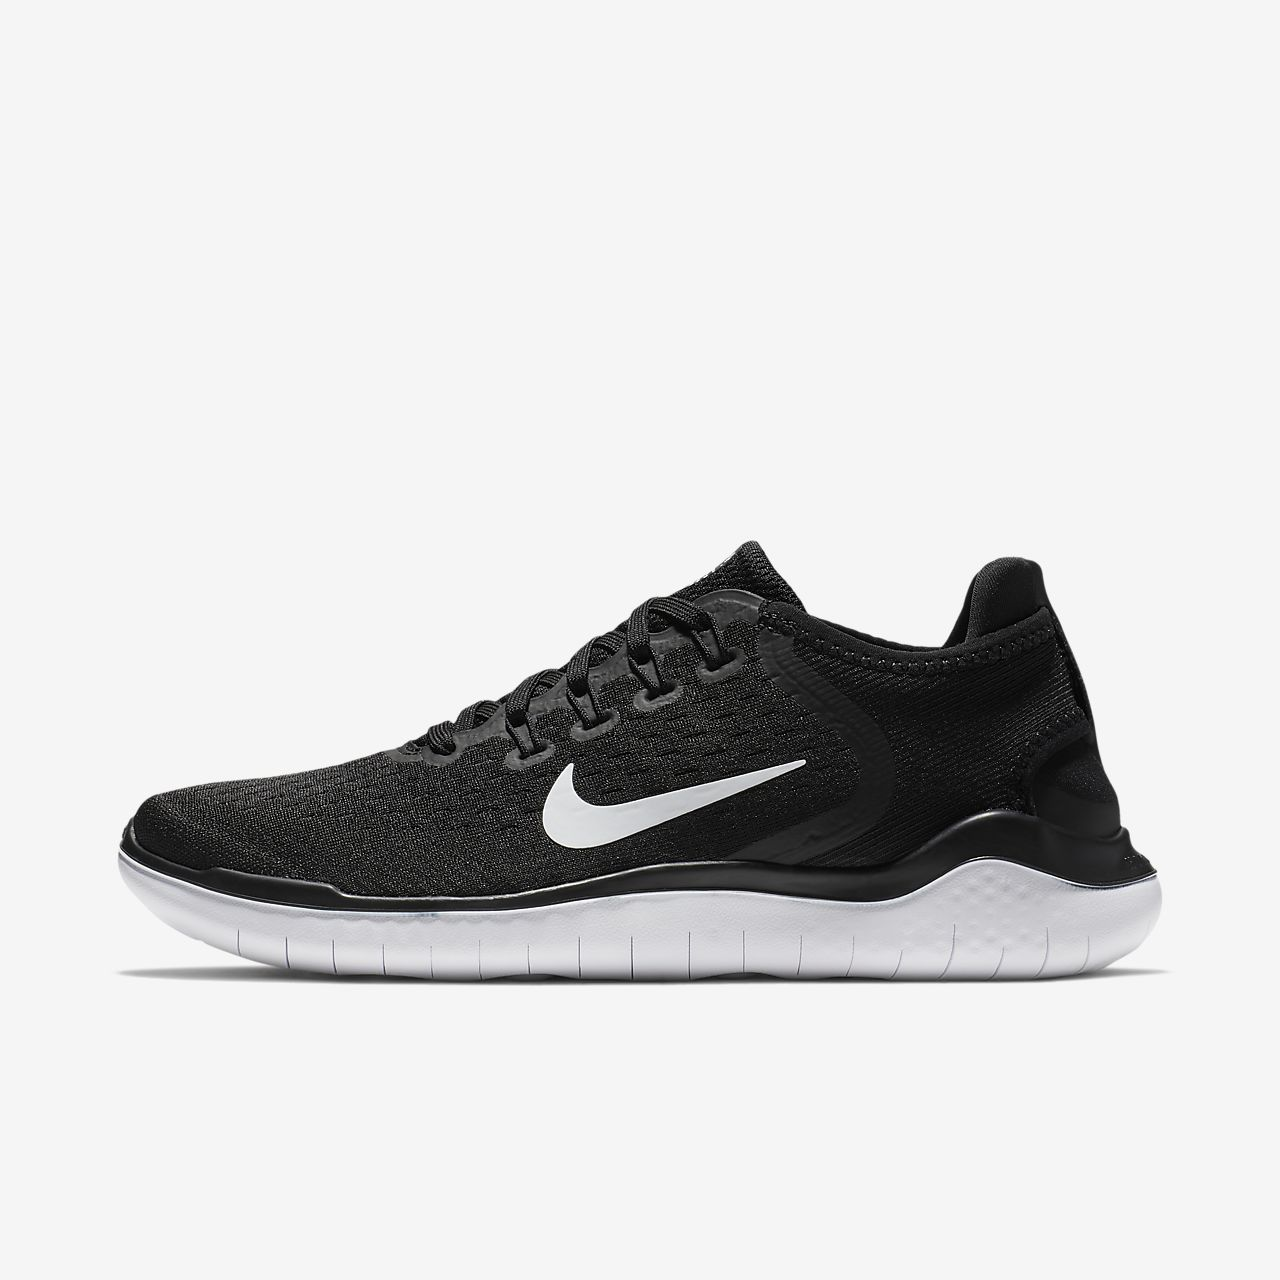 site réputé b4df1 6da38 Chaussure de running Nike Free RN 2018 pour Femme